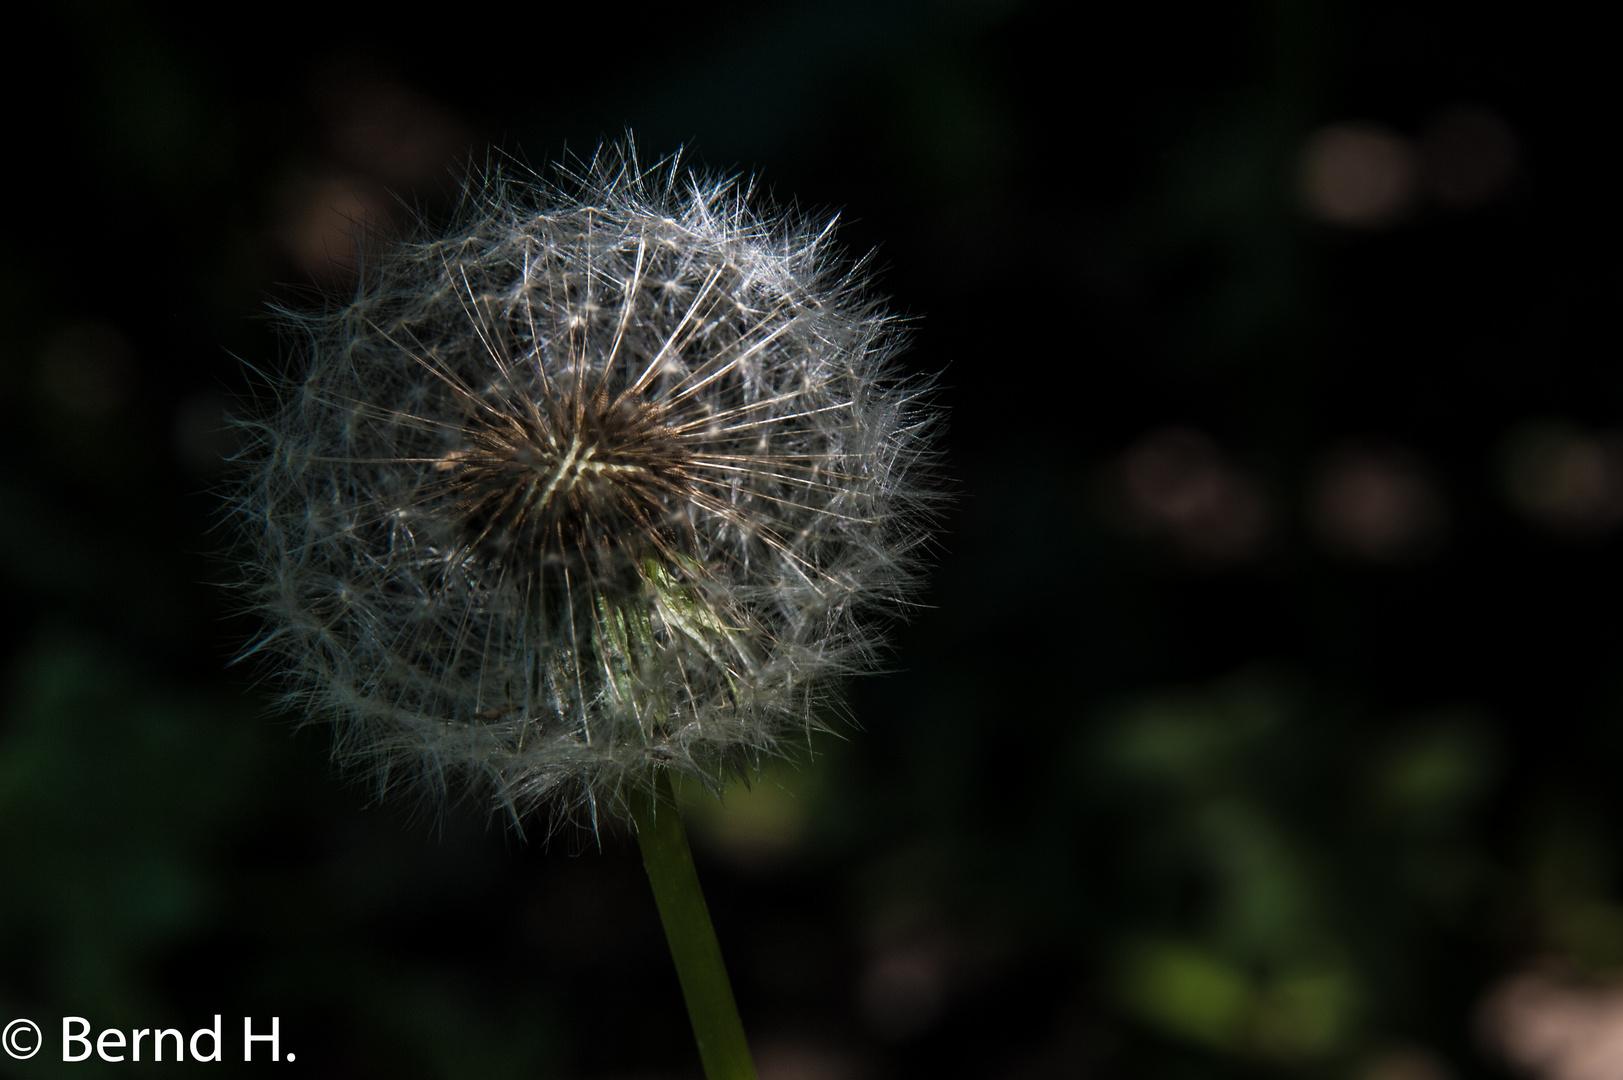 Filigranes Gartenscheusal